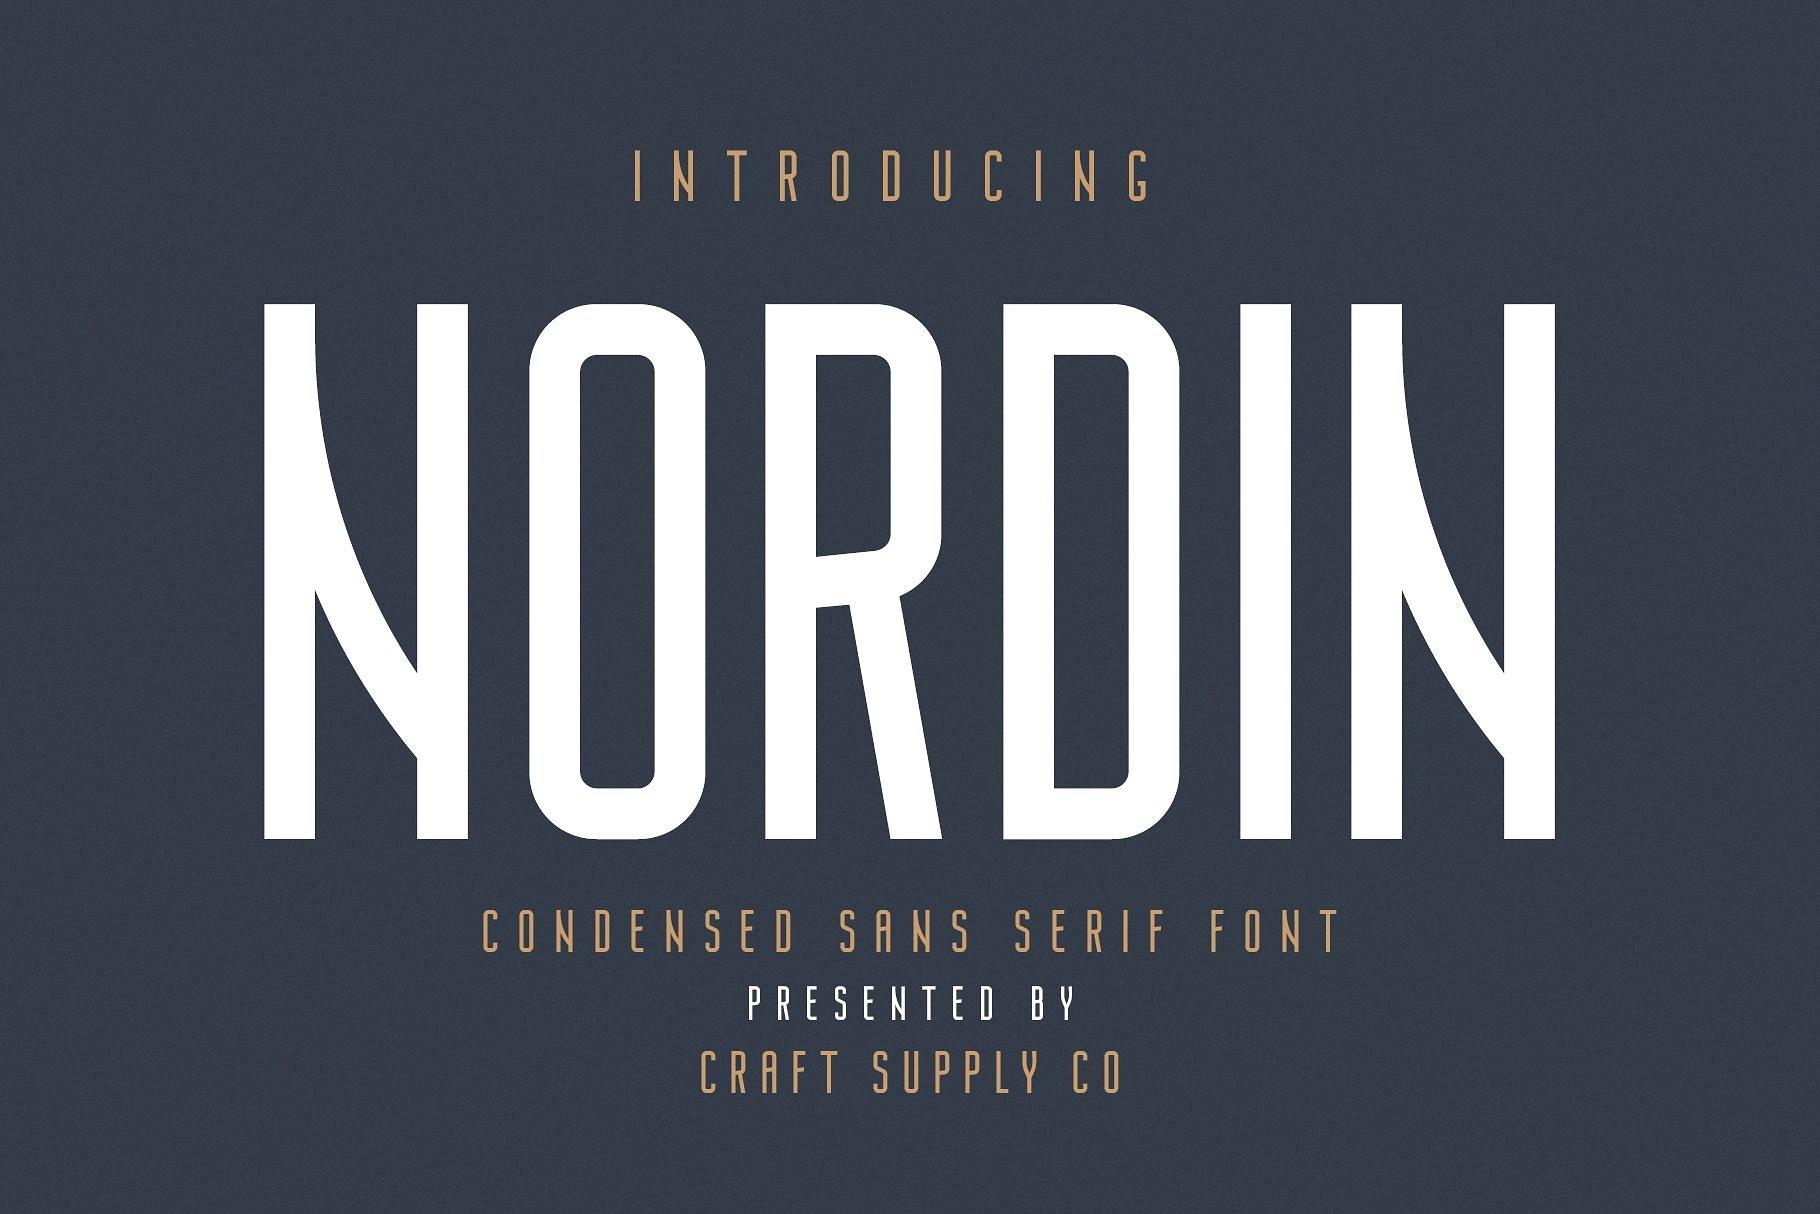 https://fontclarity.com/wp-content/uploads/2019/09/nordin-sans-serif-font-download-0.jpg Free Download